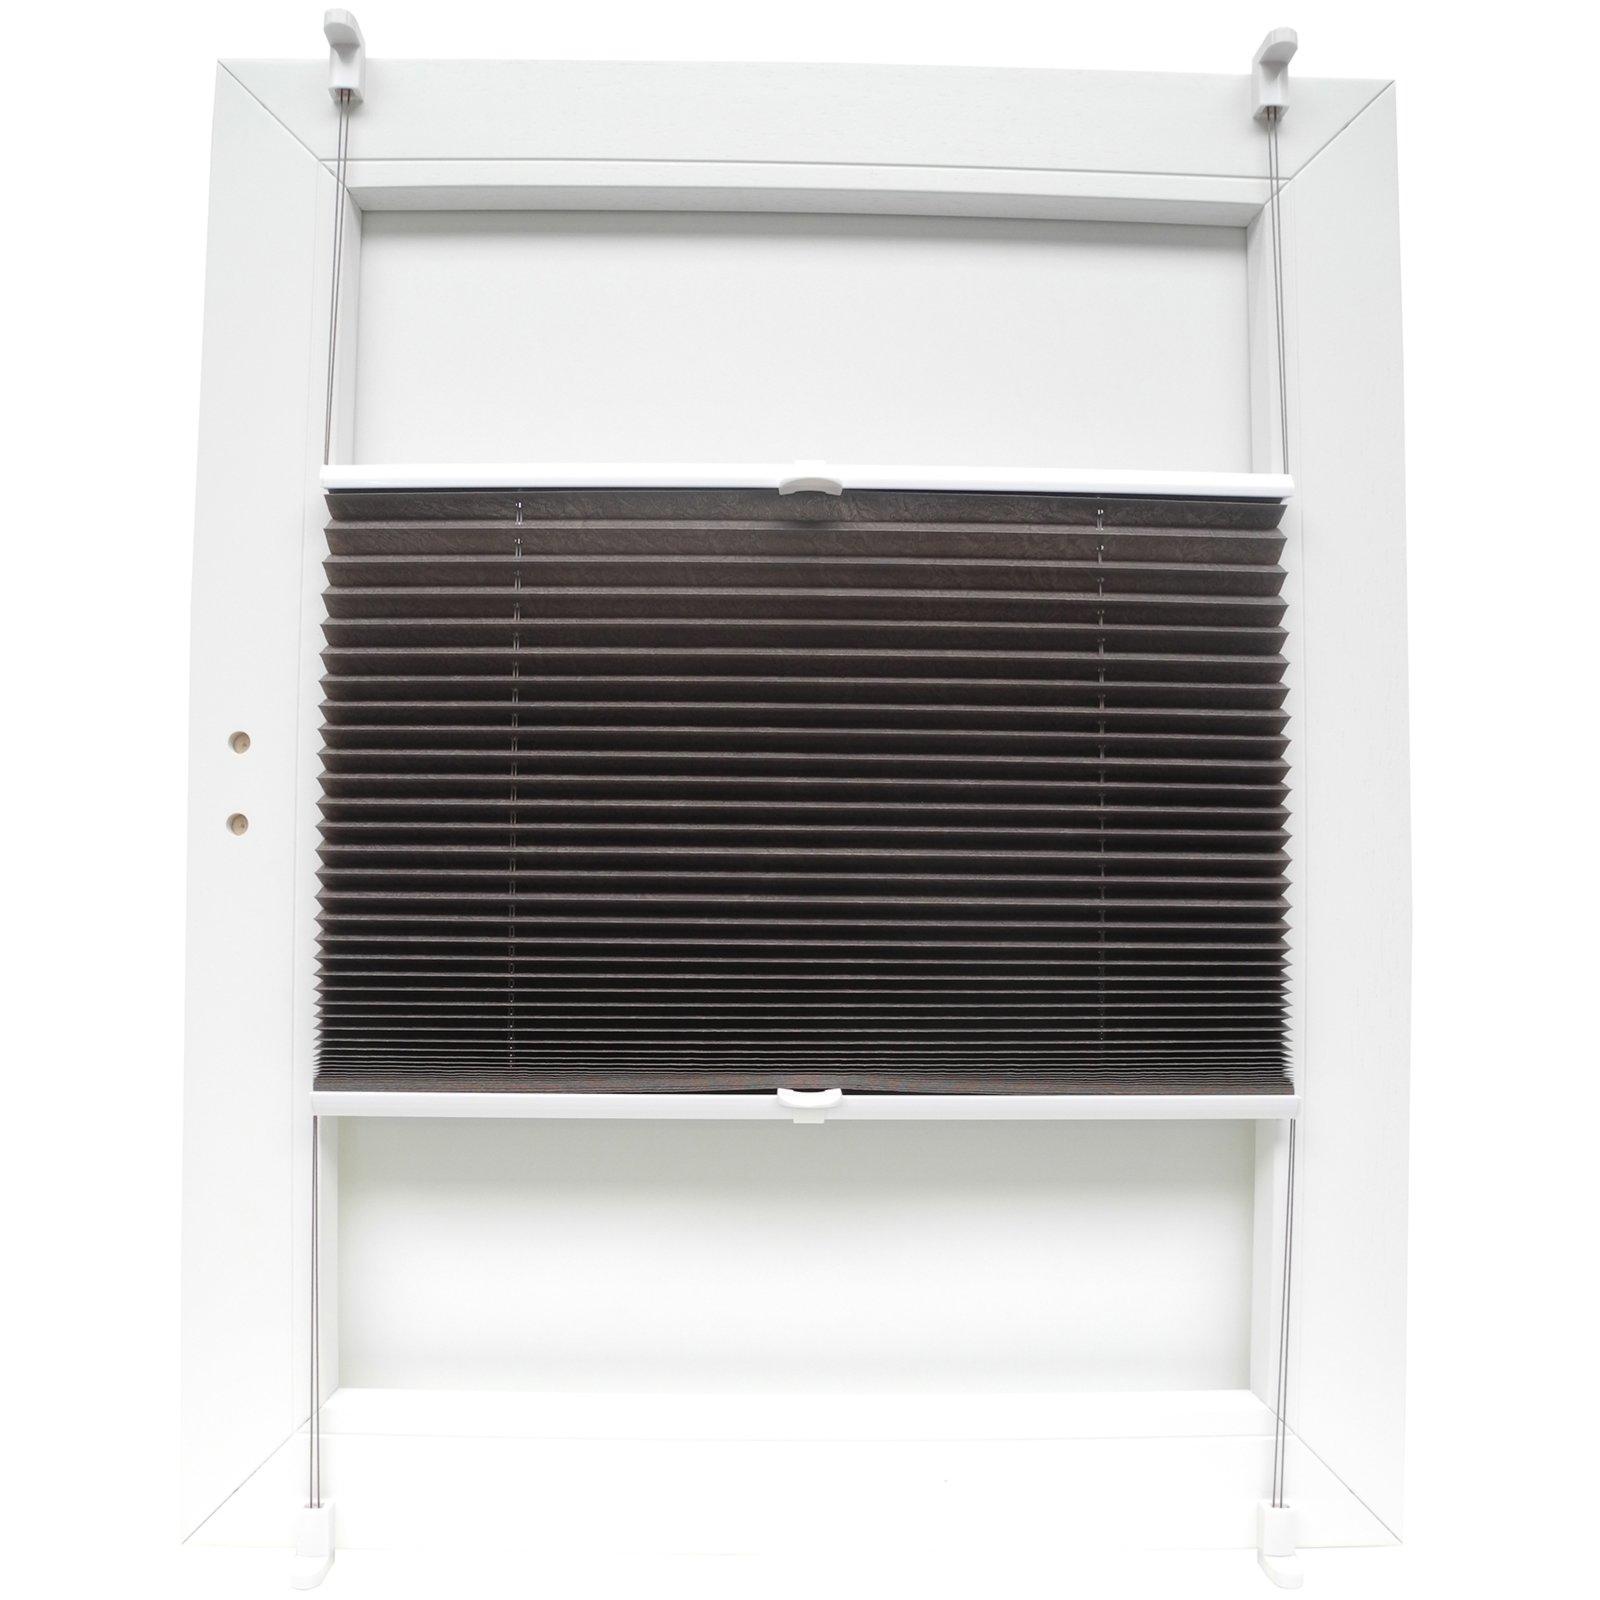 plissee sahara taupe 50x130 cm plissees rollos jalousien deko haushalt roller. Black Bedroom Furniture Sets. Home Design Ideas